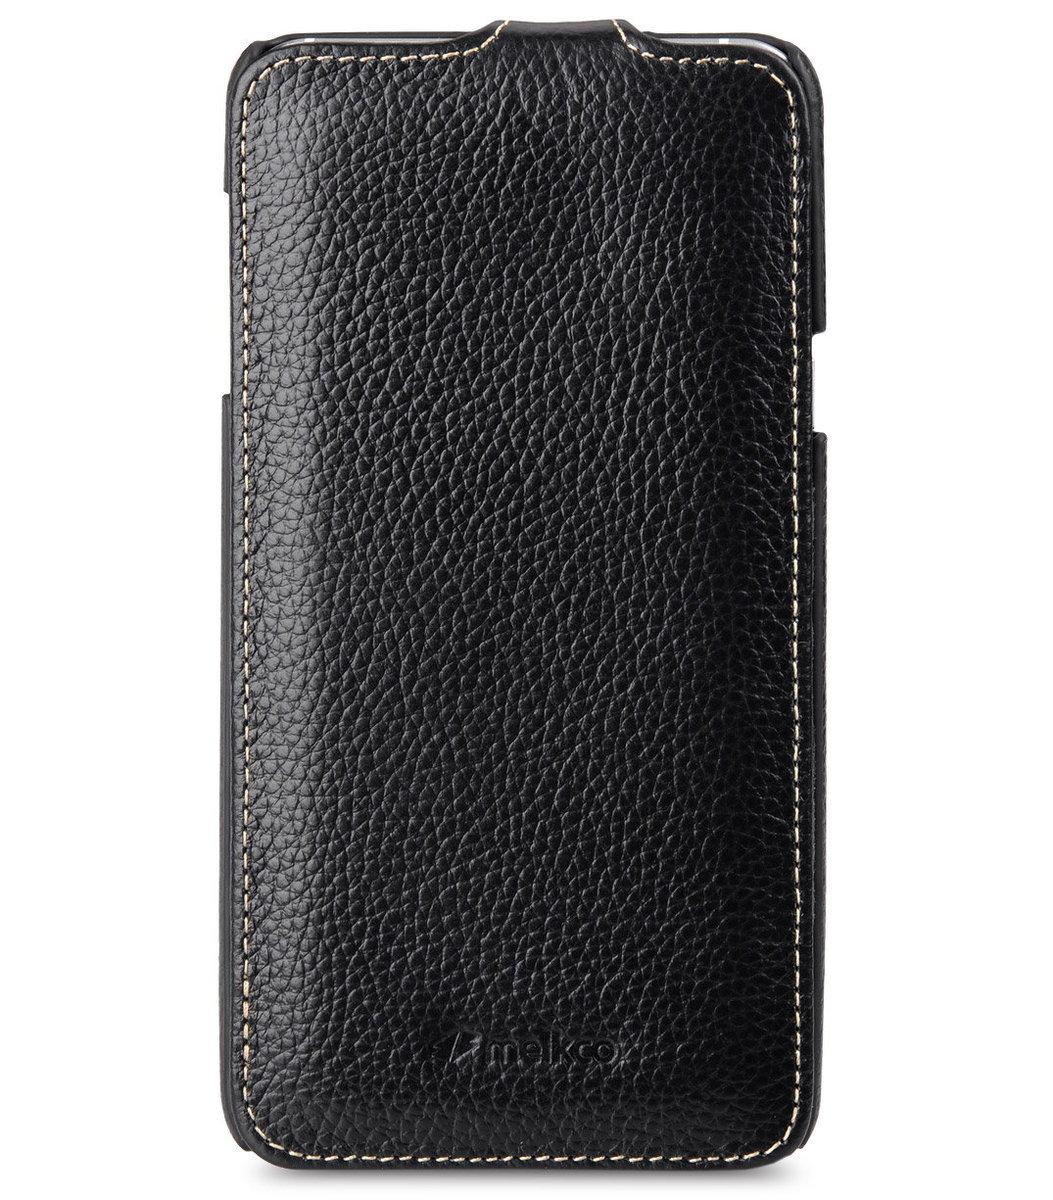 Samsung Galaxy Note 5 Jacka Type 高級真皮革手機套 - 黑色荔枝紋